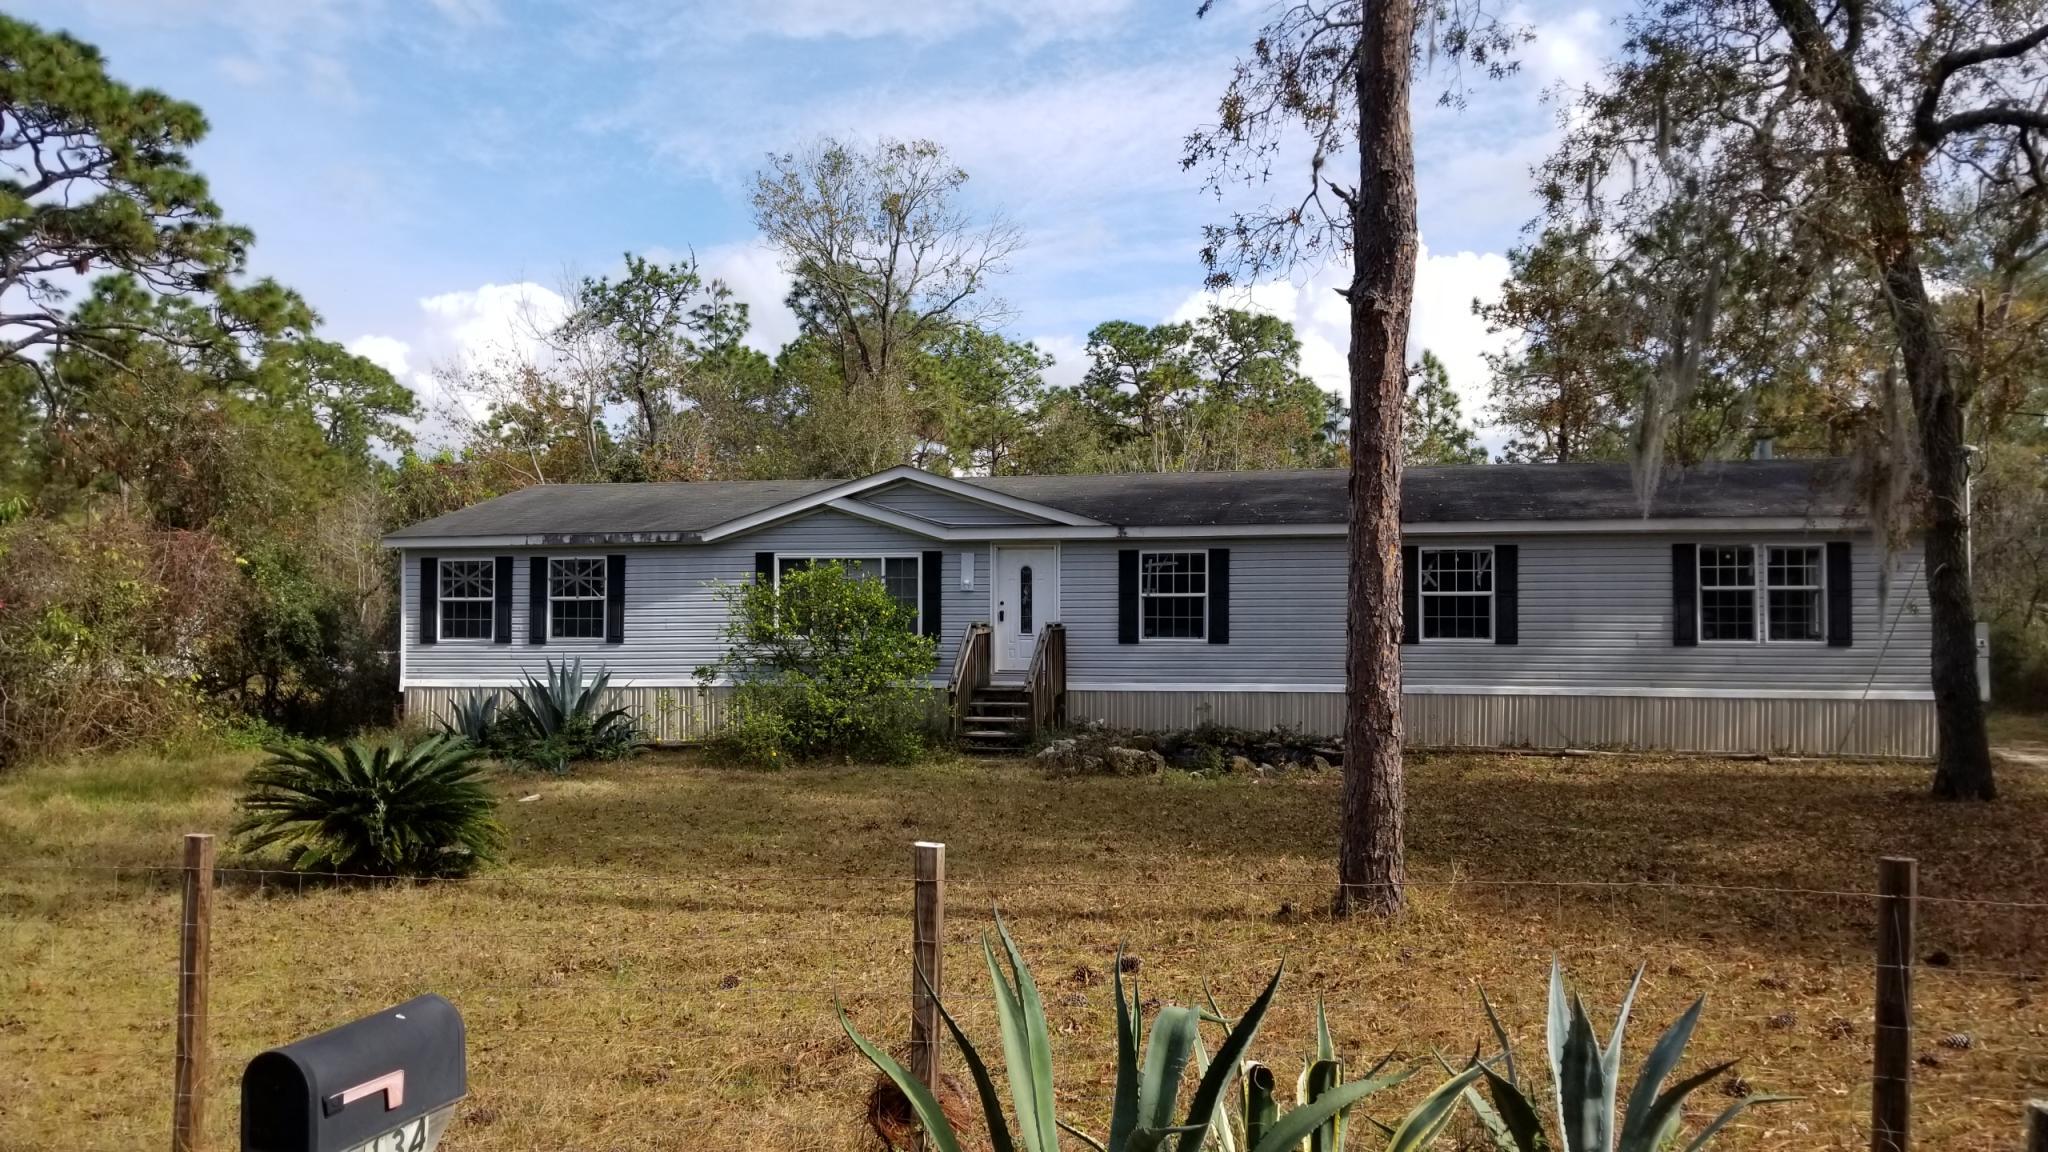 134 Lake Galilee Dr, Hawthorne, FL 32640 For Rent | Trulia